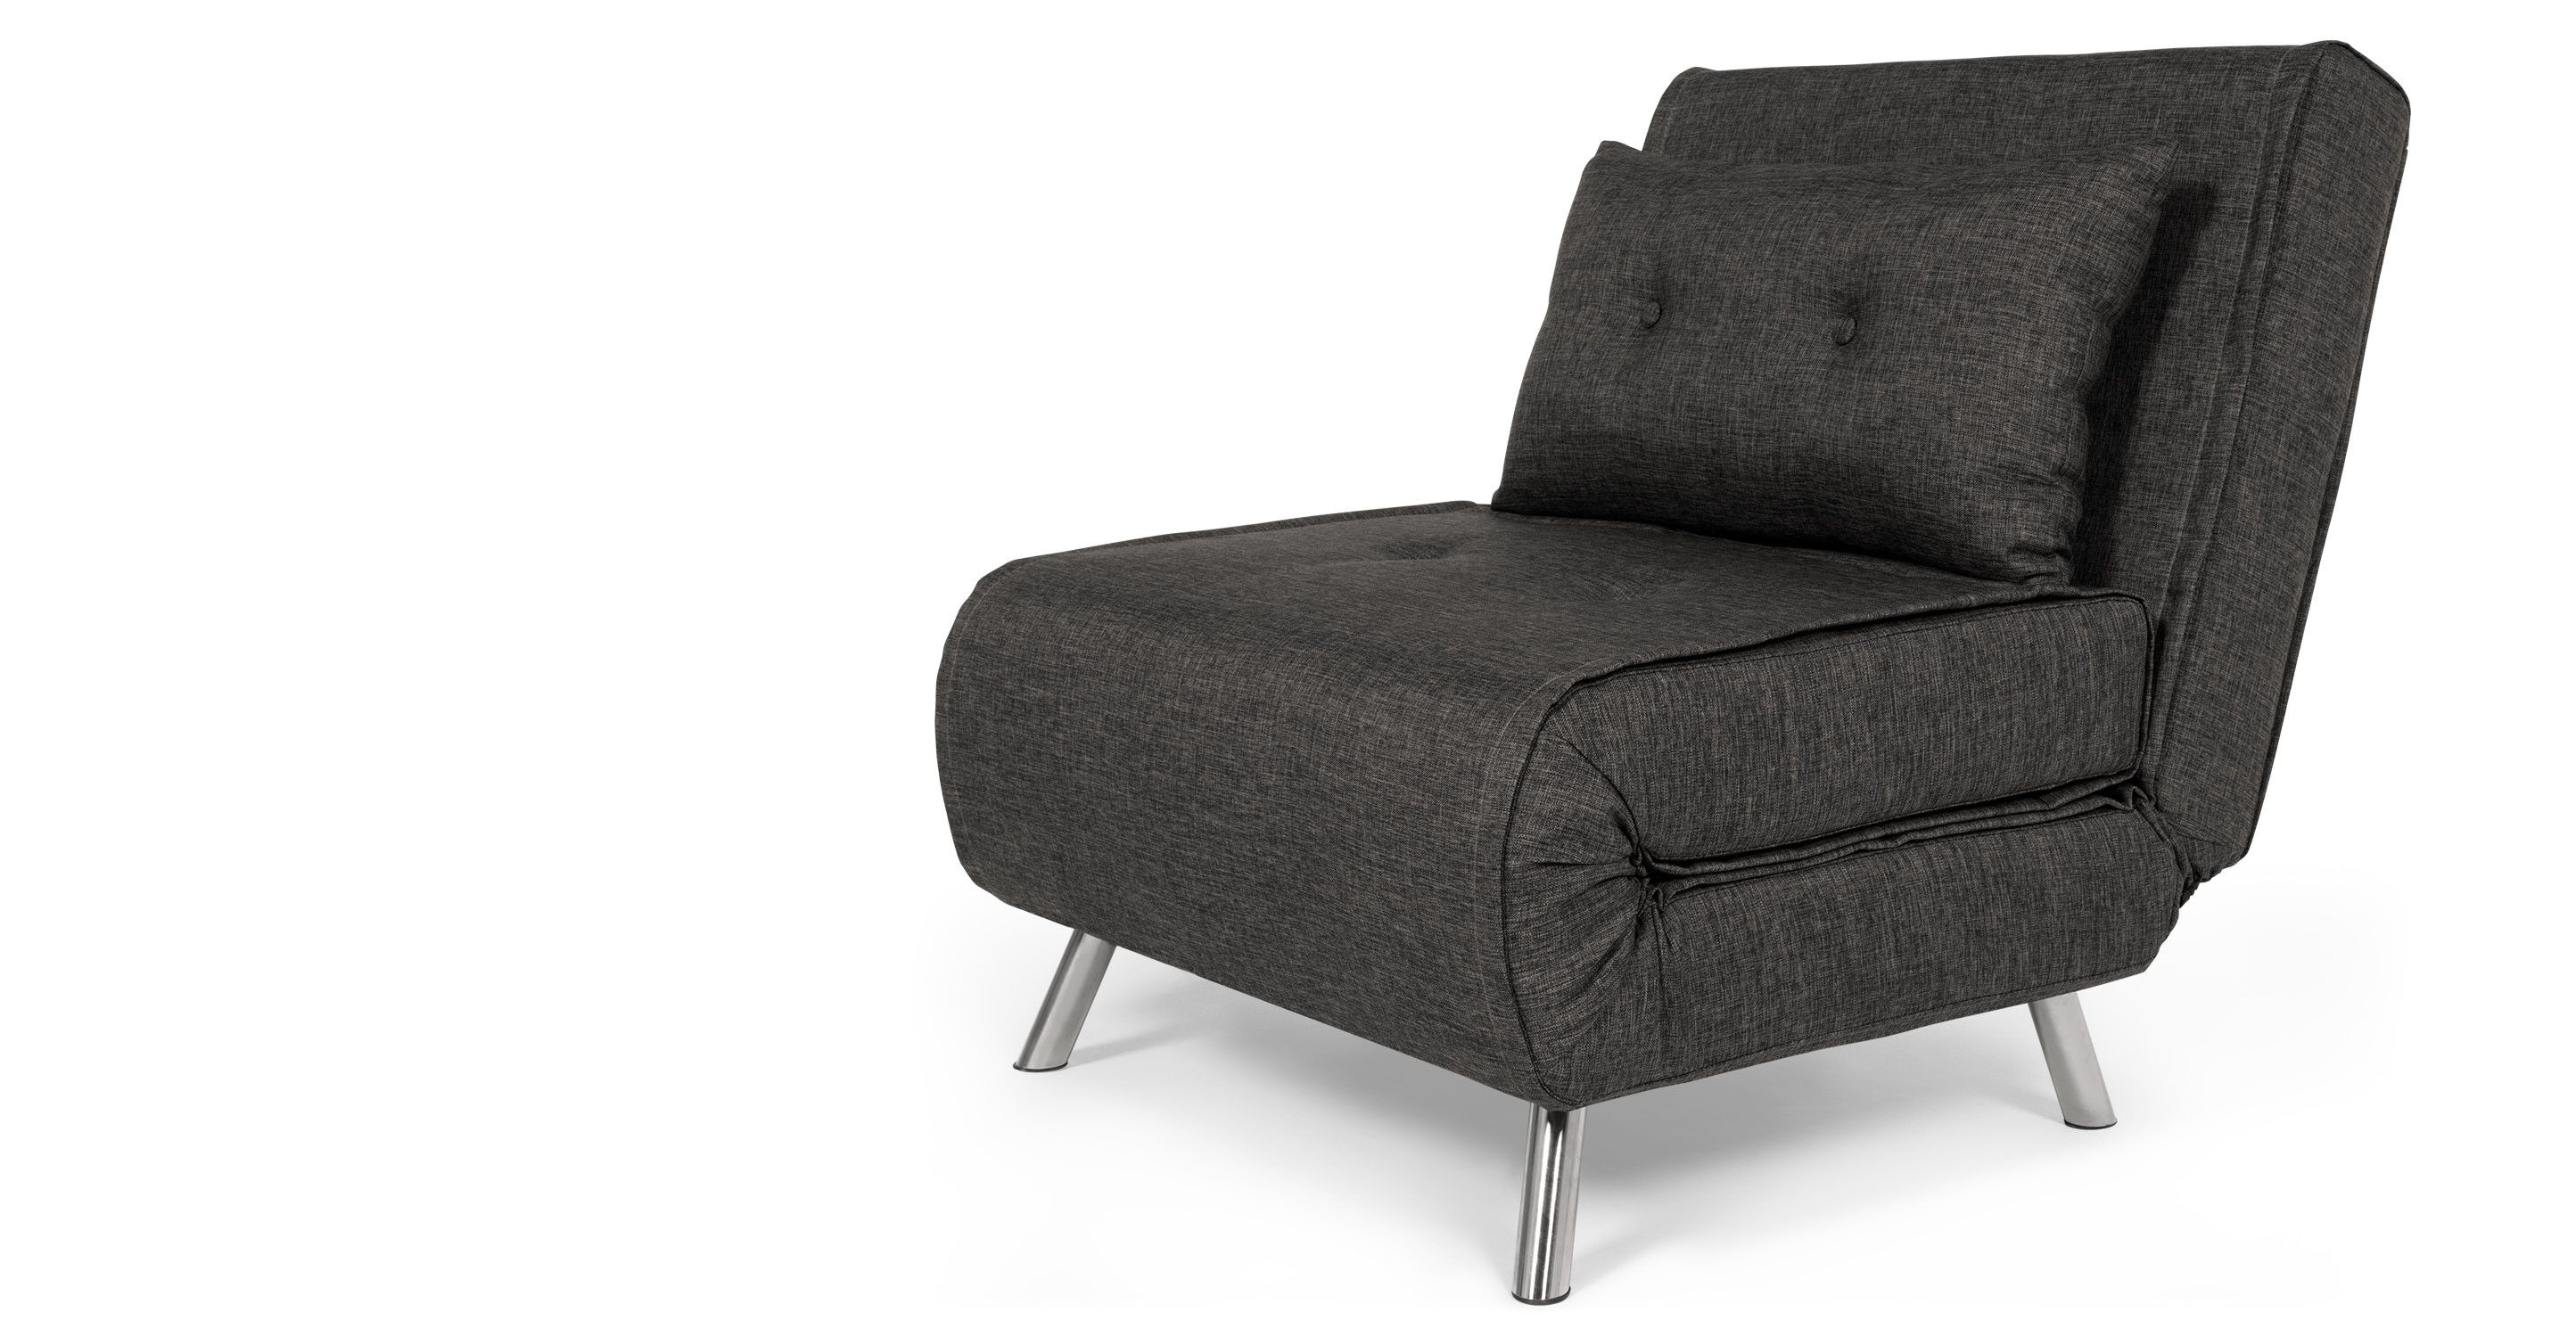 Haru Single Sofa Bed Cygnet Grey Overstuffed Chairs Sofas Accent Design